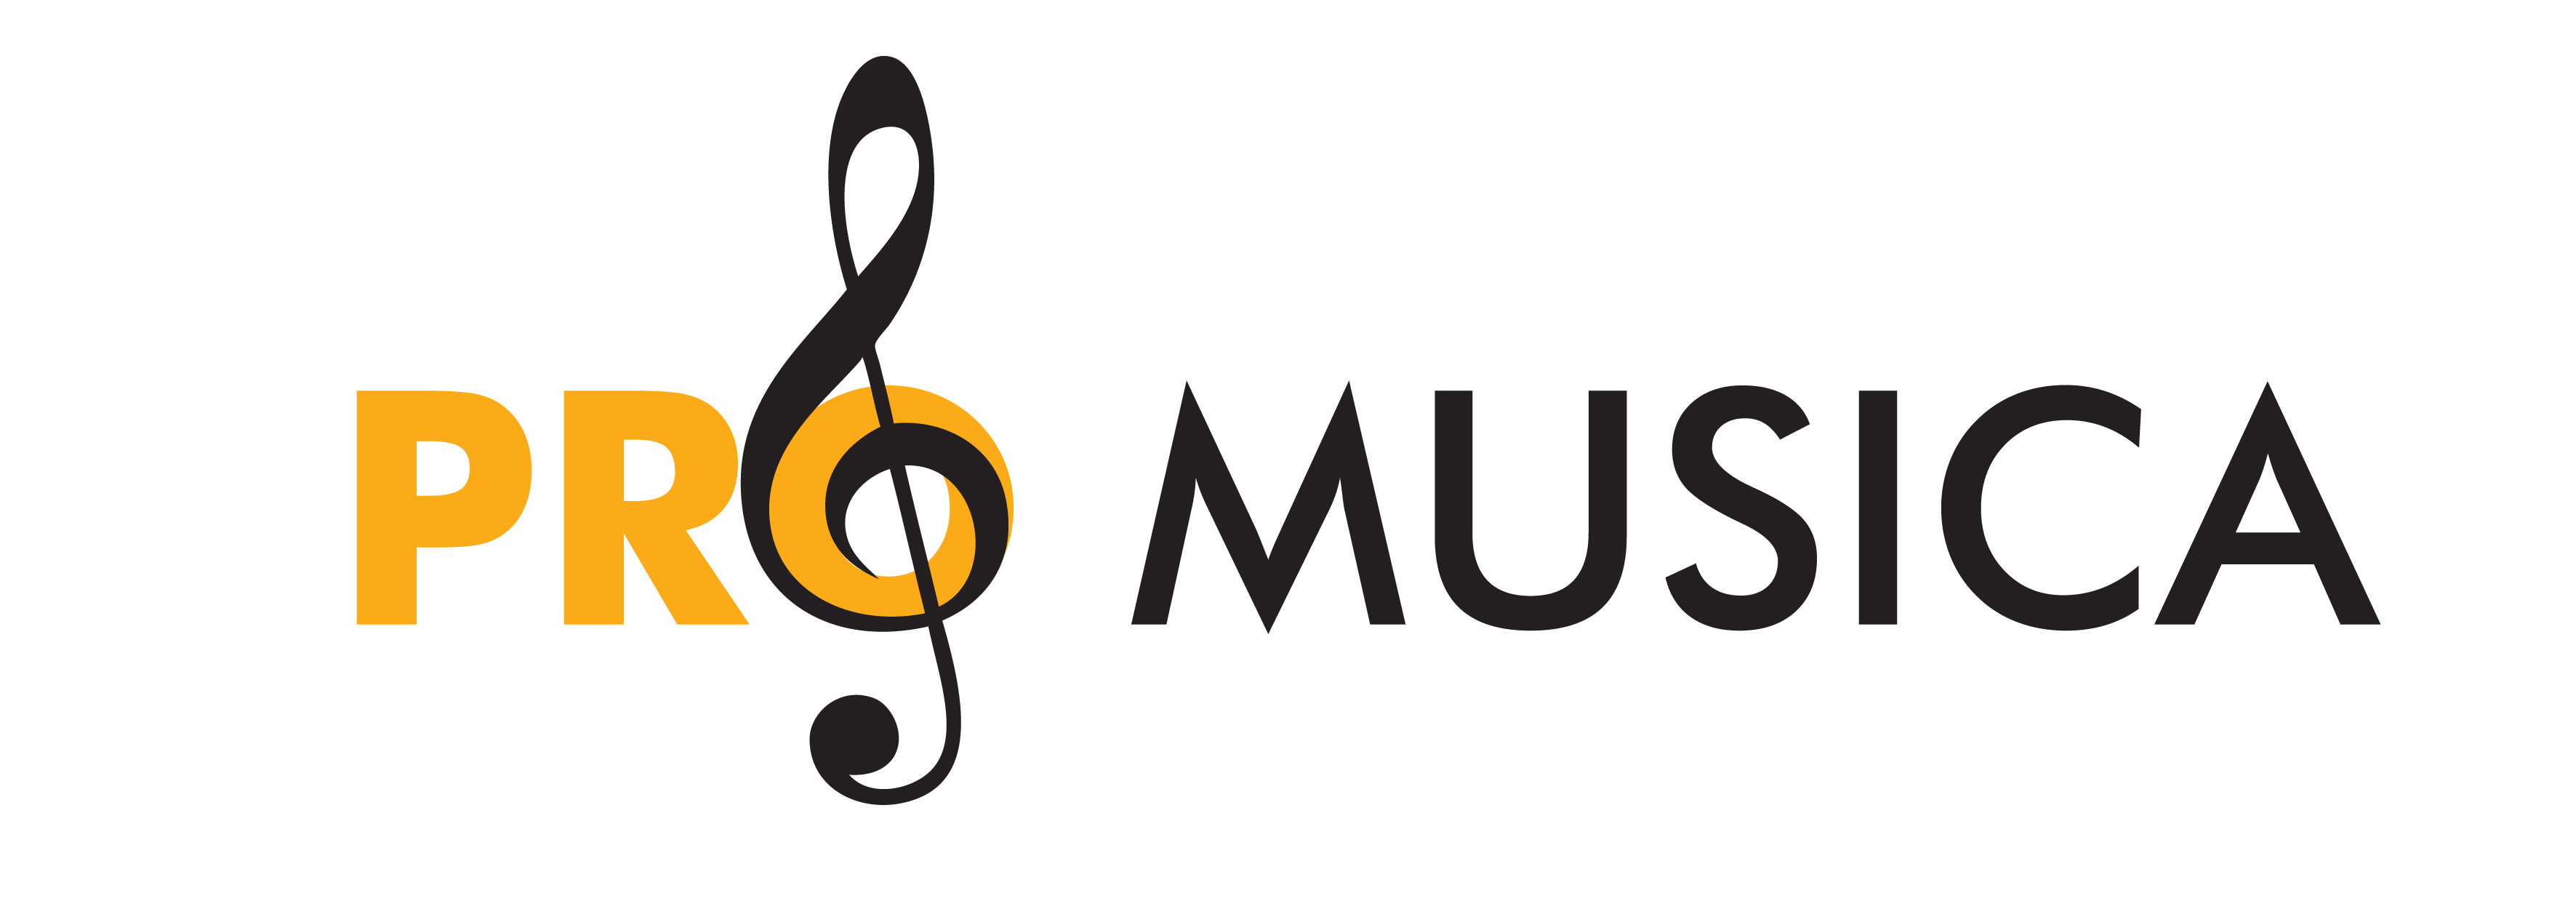 PROmusica (1) (1)